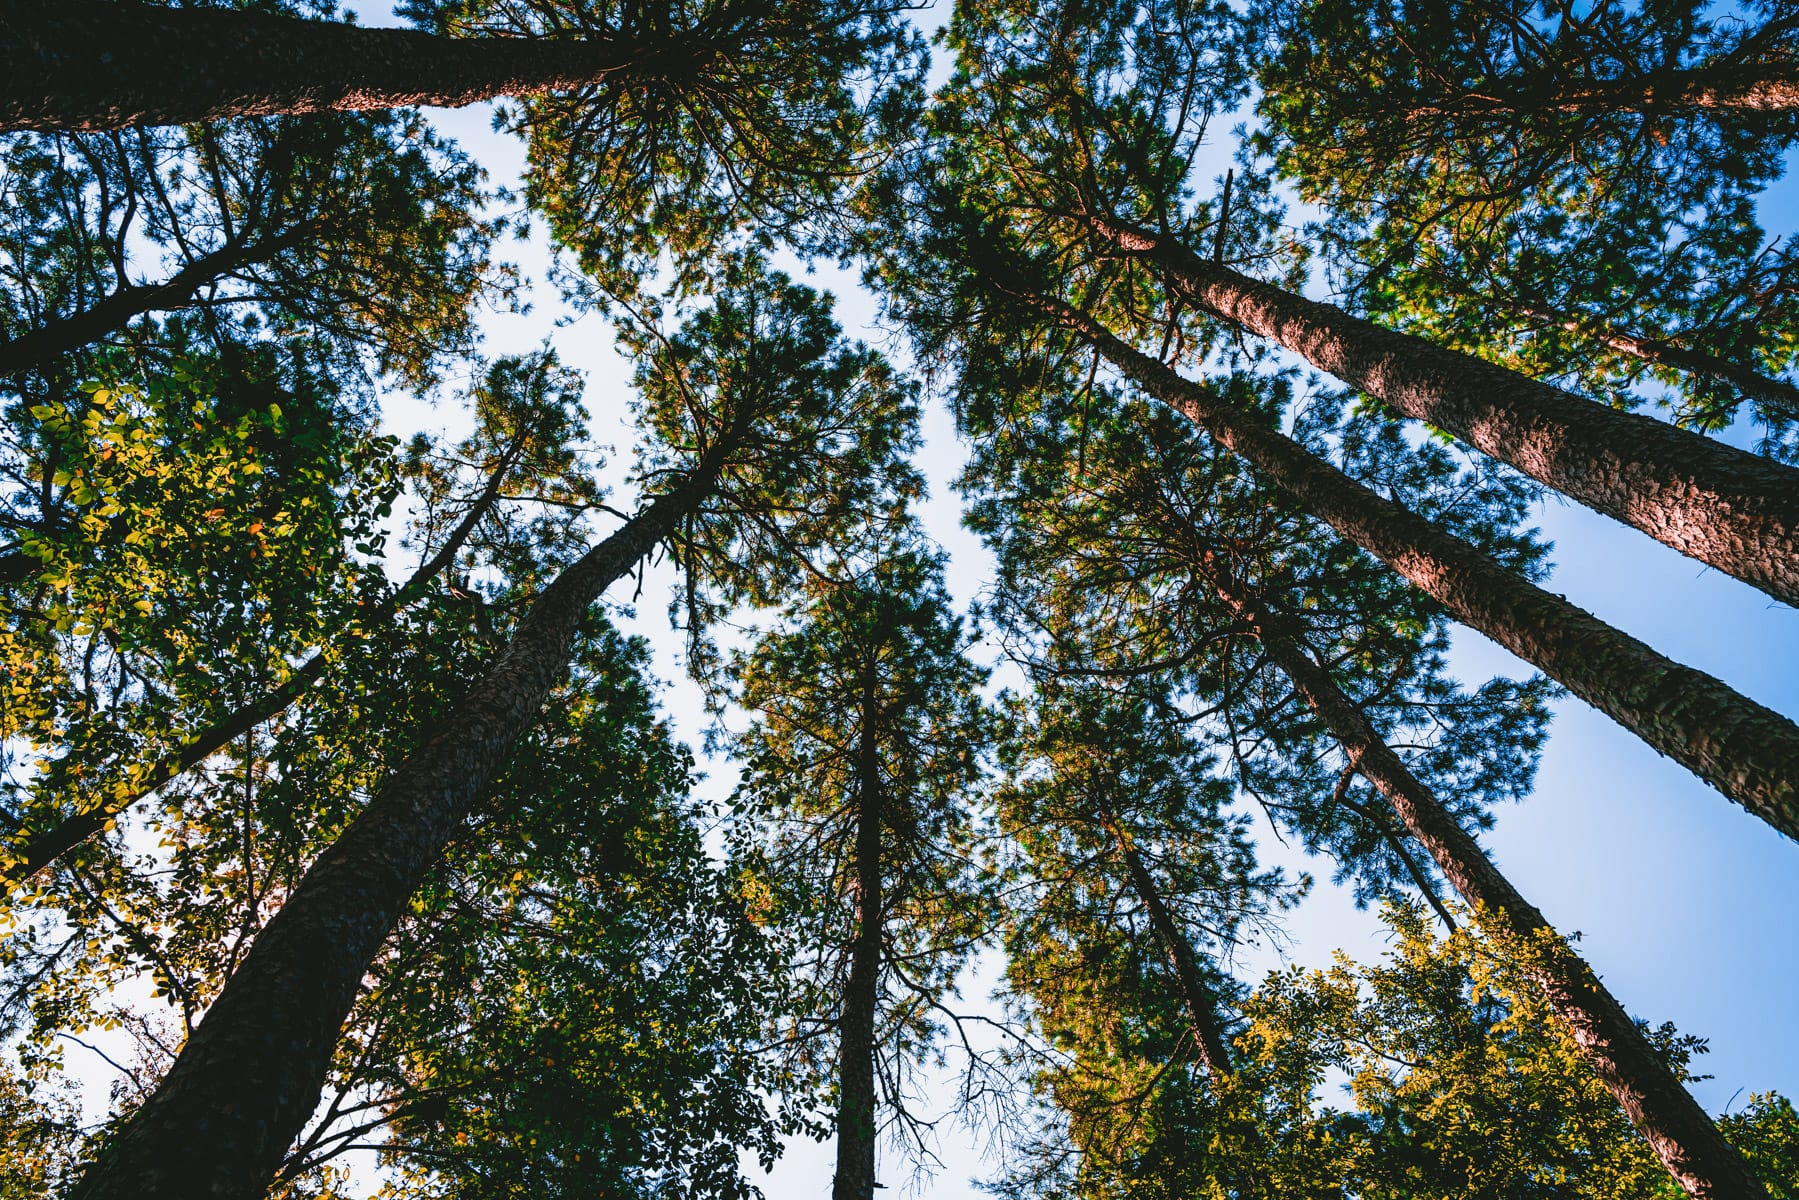 Pine trees grow towards the sky at East Texas' Lake Bob Sandlin State Park.